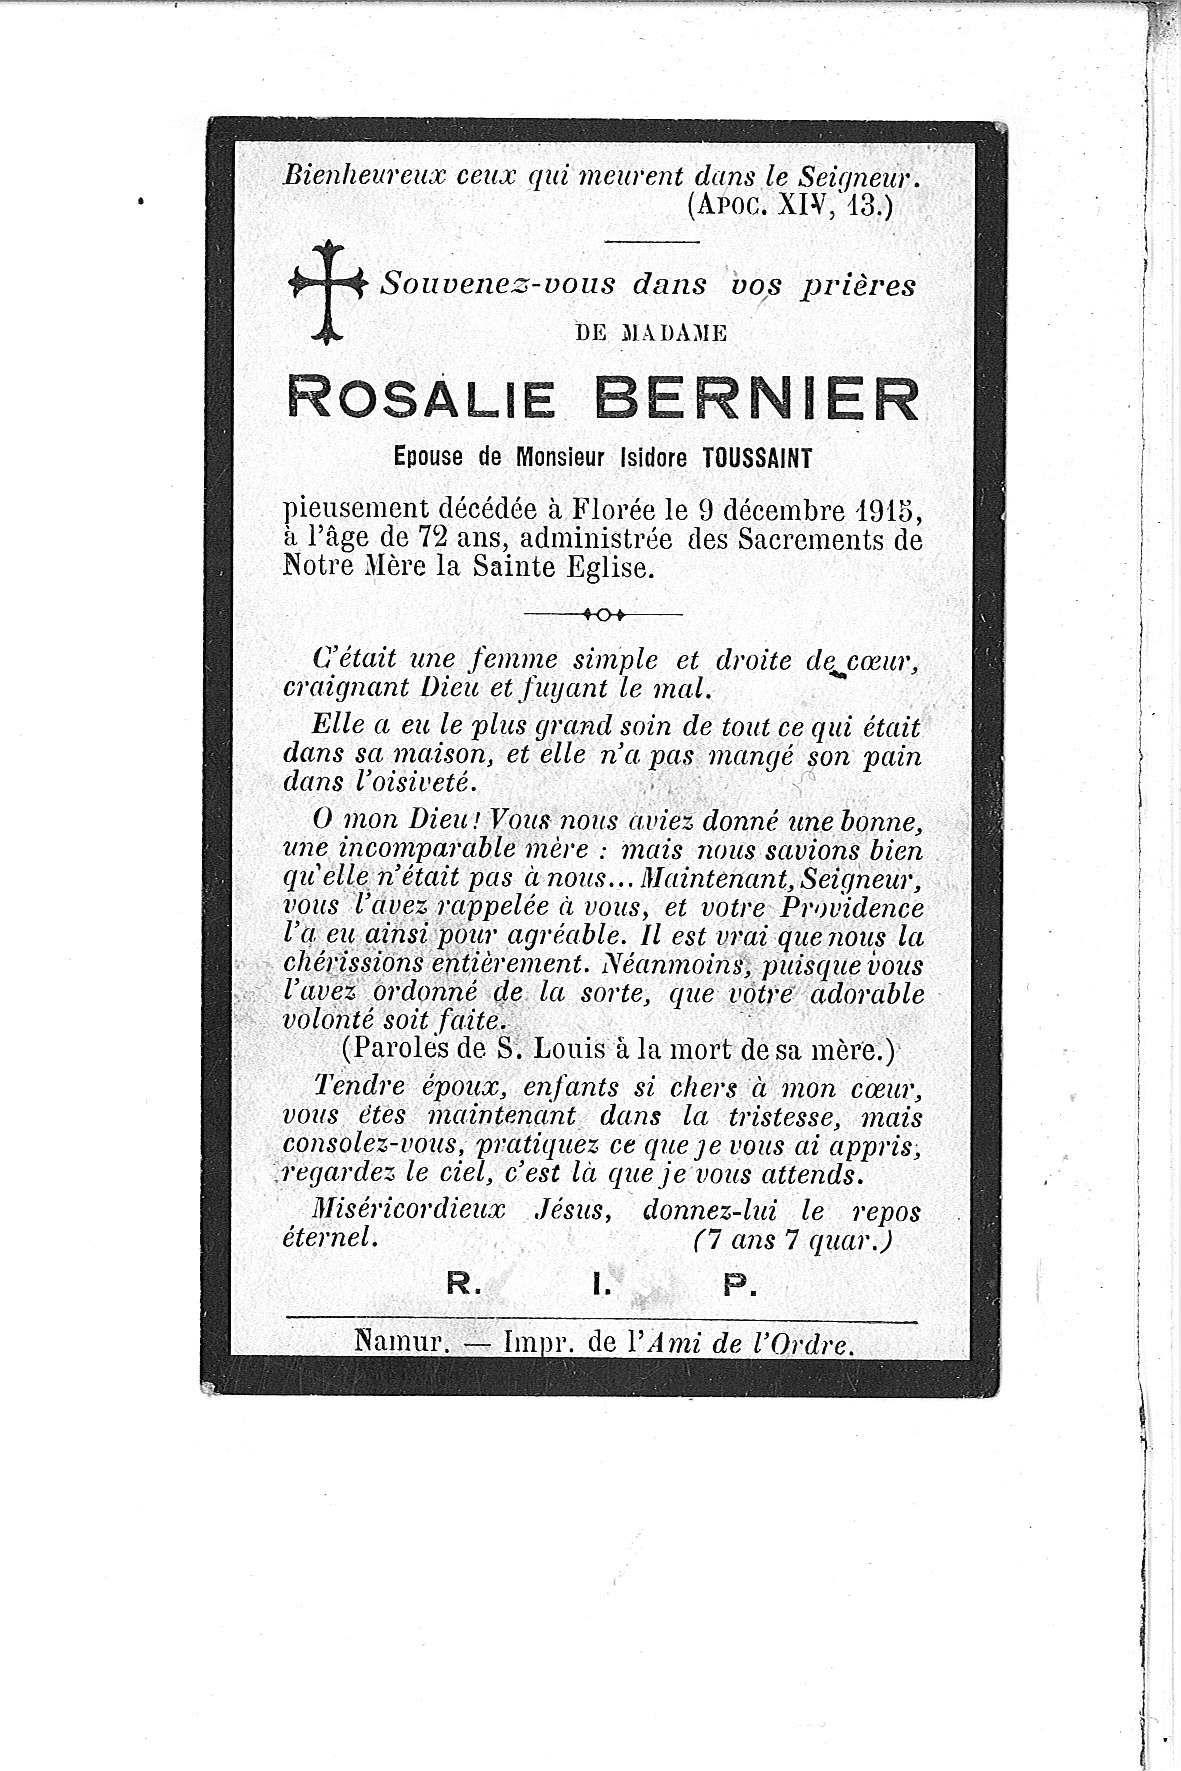 Rosalie(1915)20110114152404_00005.jpg